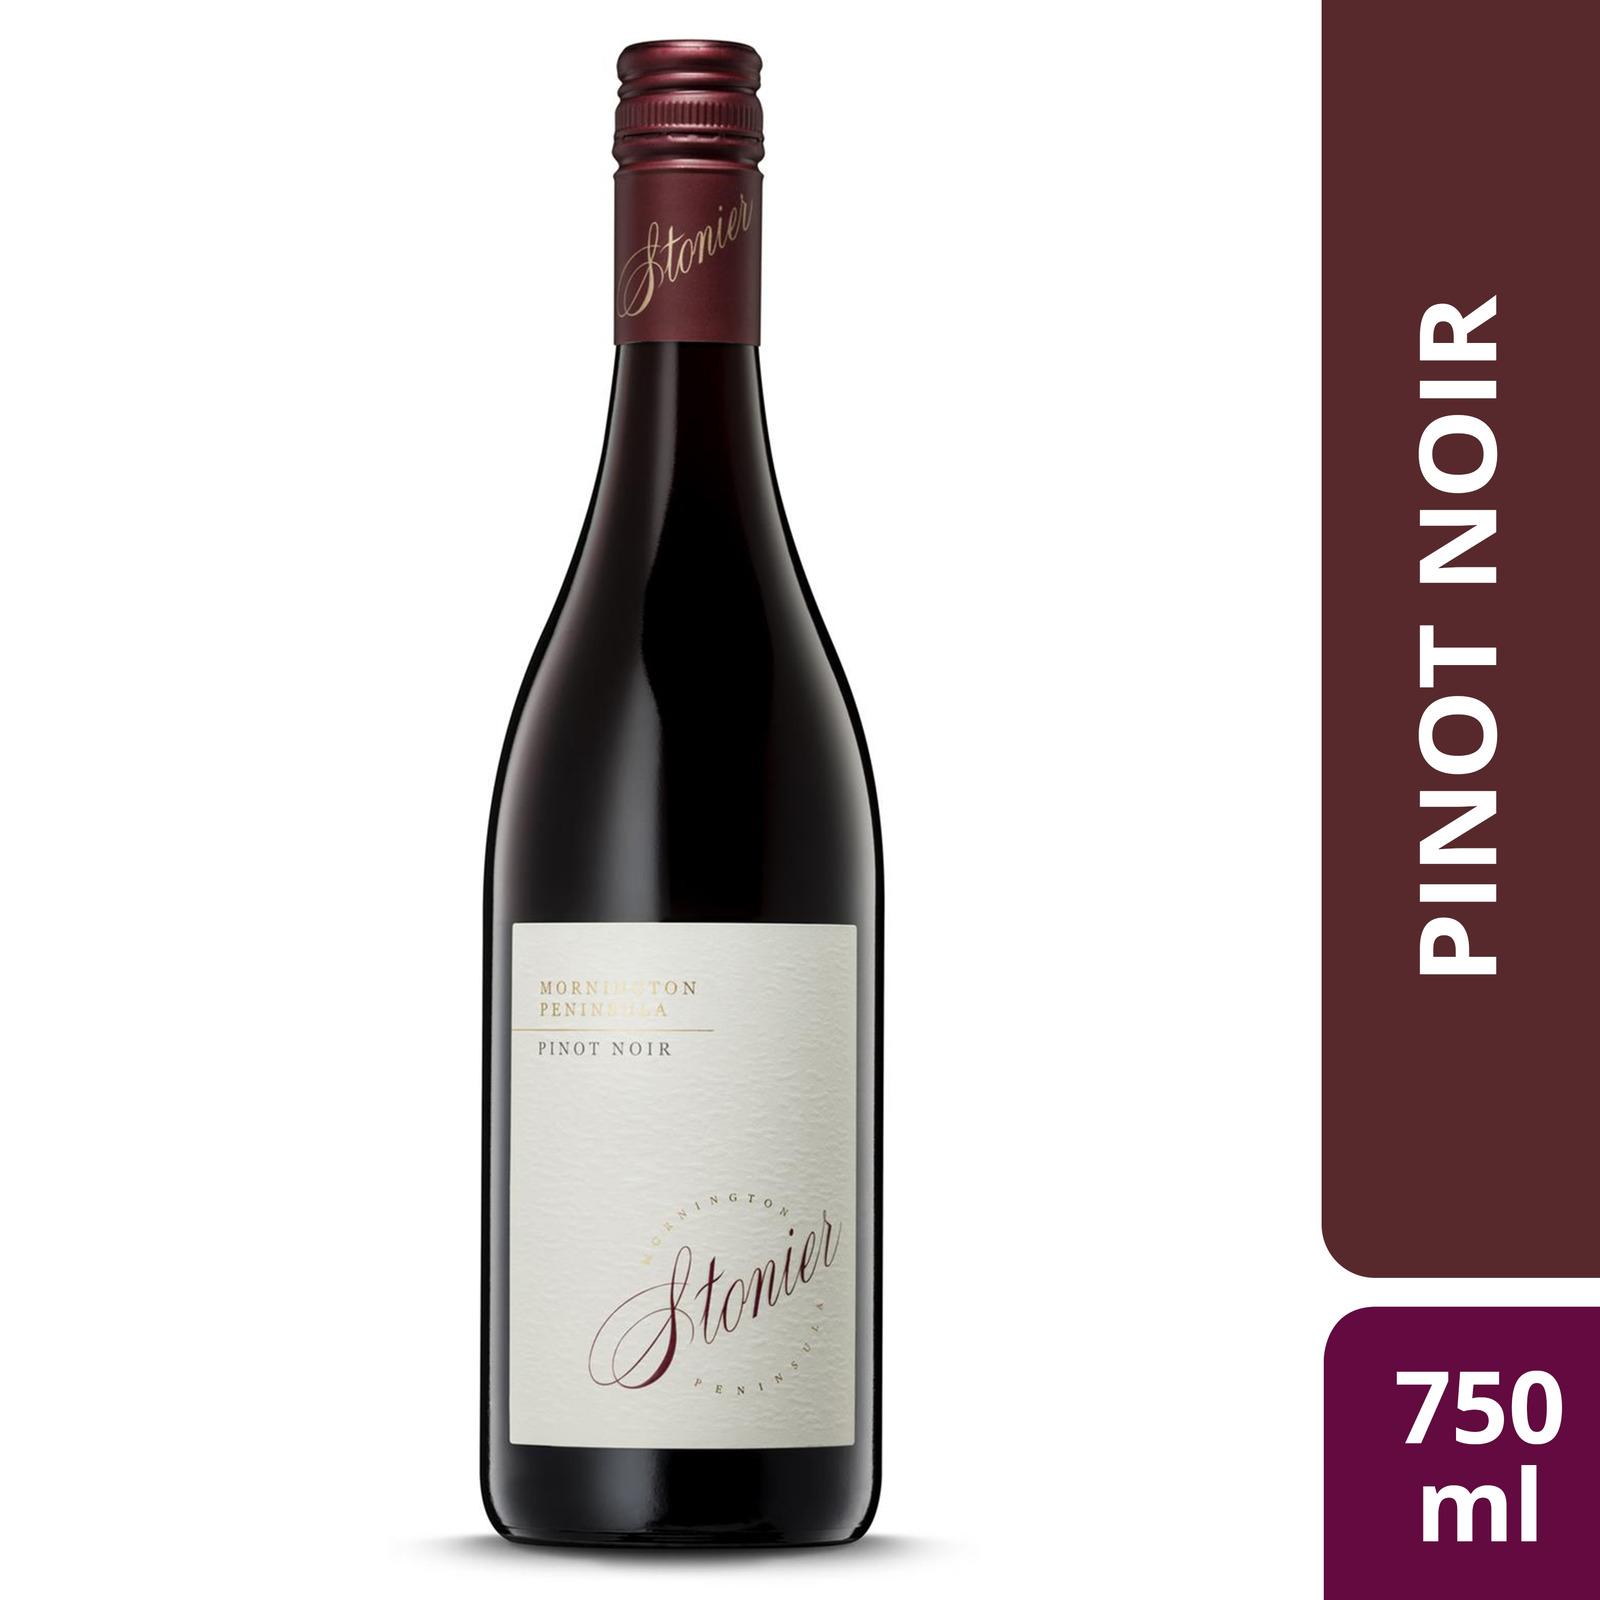 Stonier Pinot Noir-By Culina